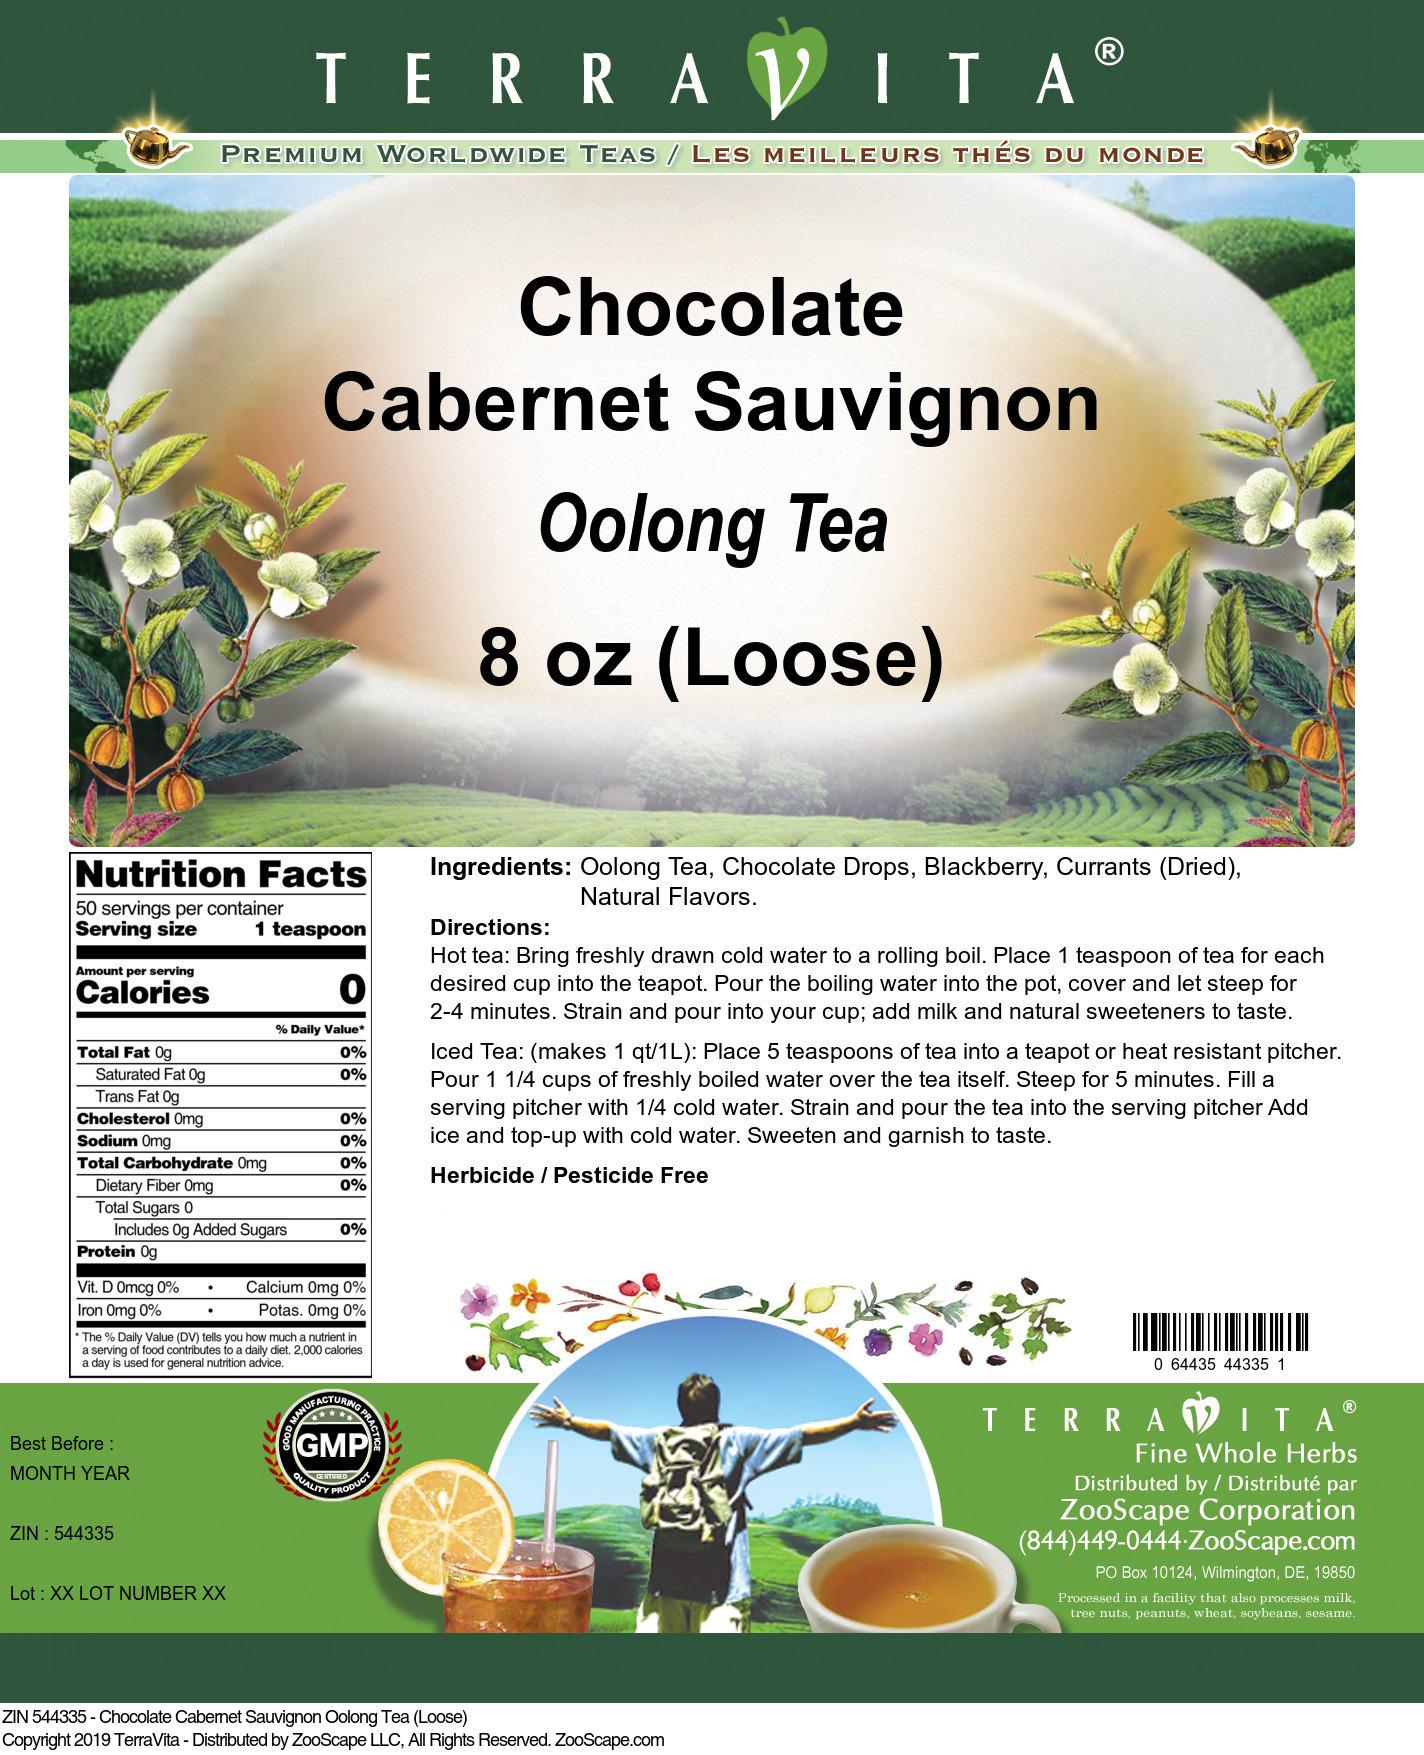 Chocolate Cabernet Sauvignon Oolong Tea